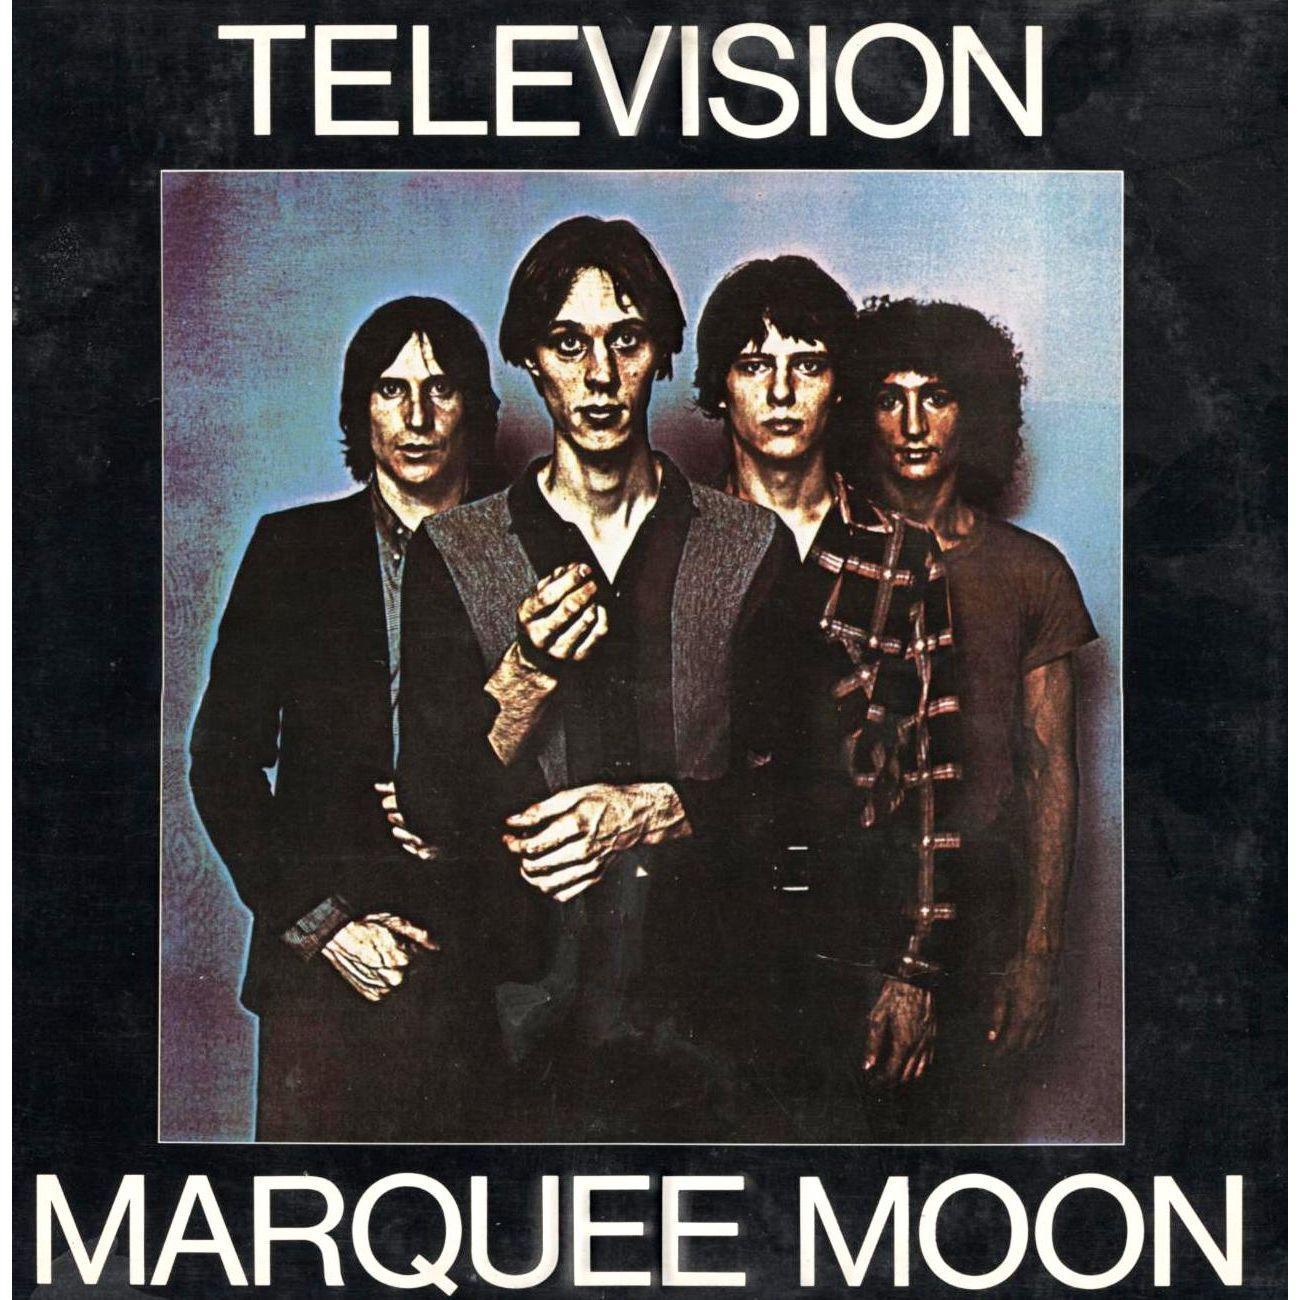 Marquee-Moon-Vinyl-Rip-2012-cover.jpg